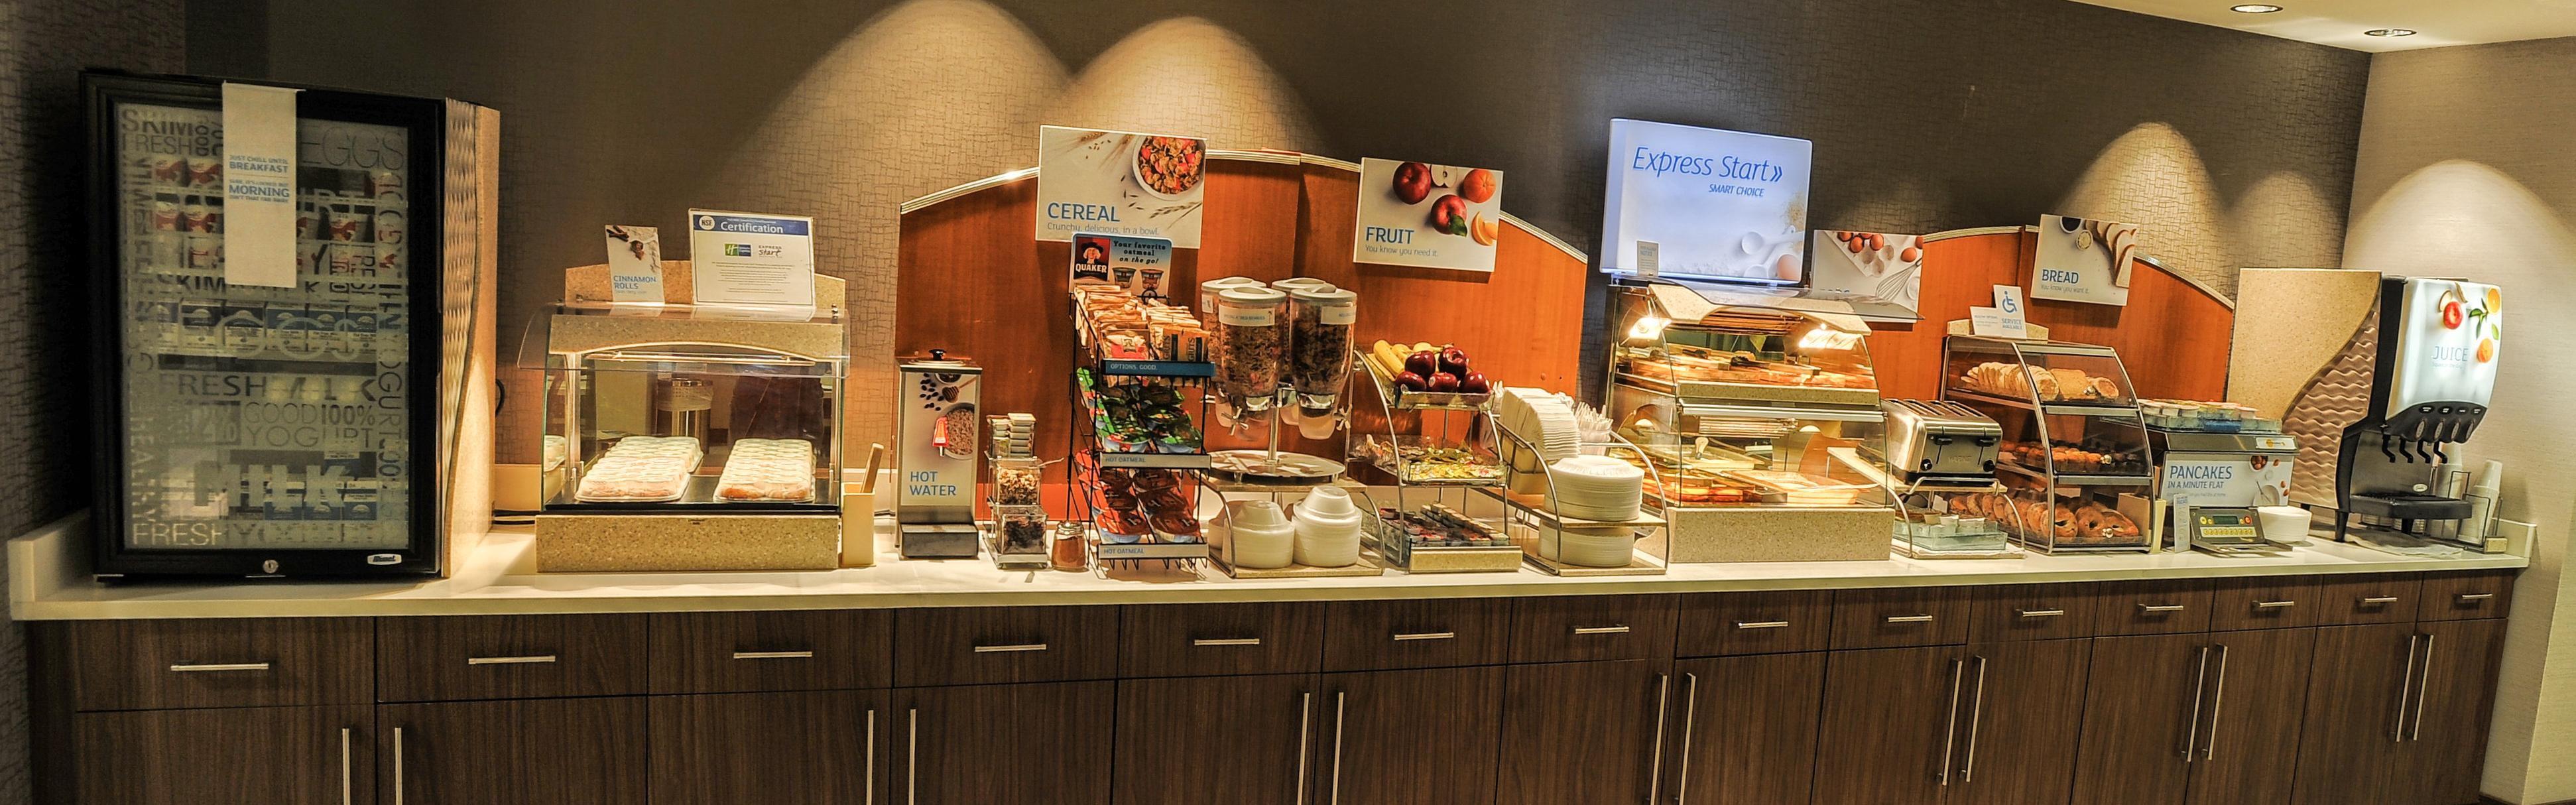 Holiday Inn Express Pell City image 3